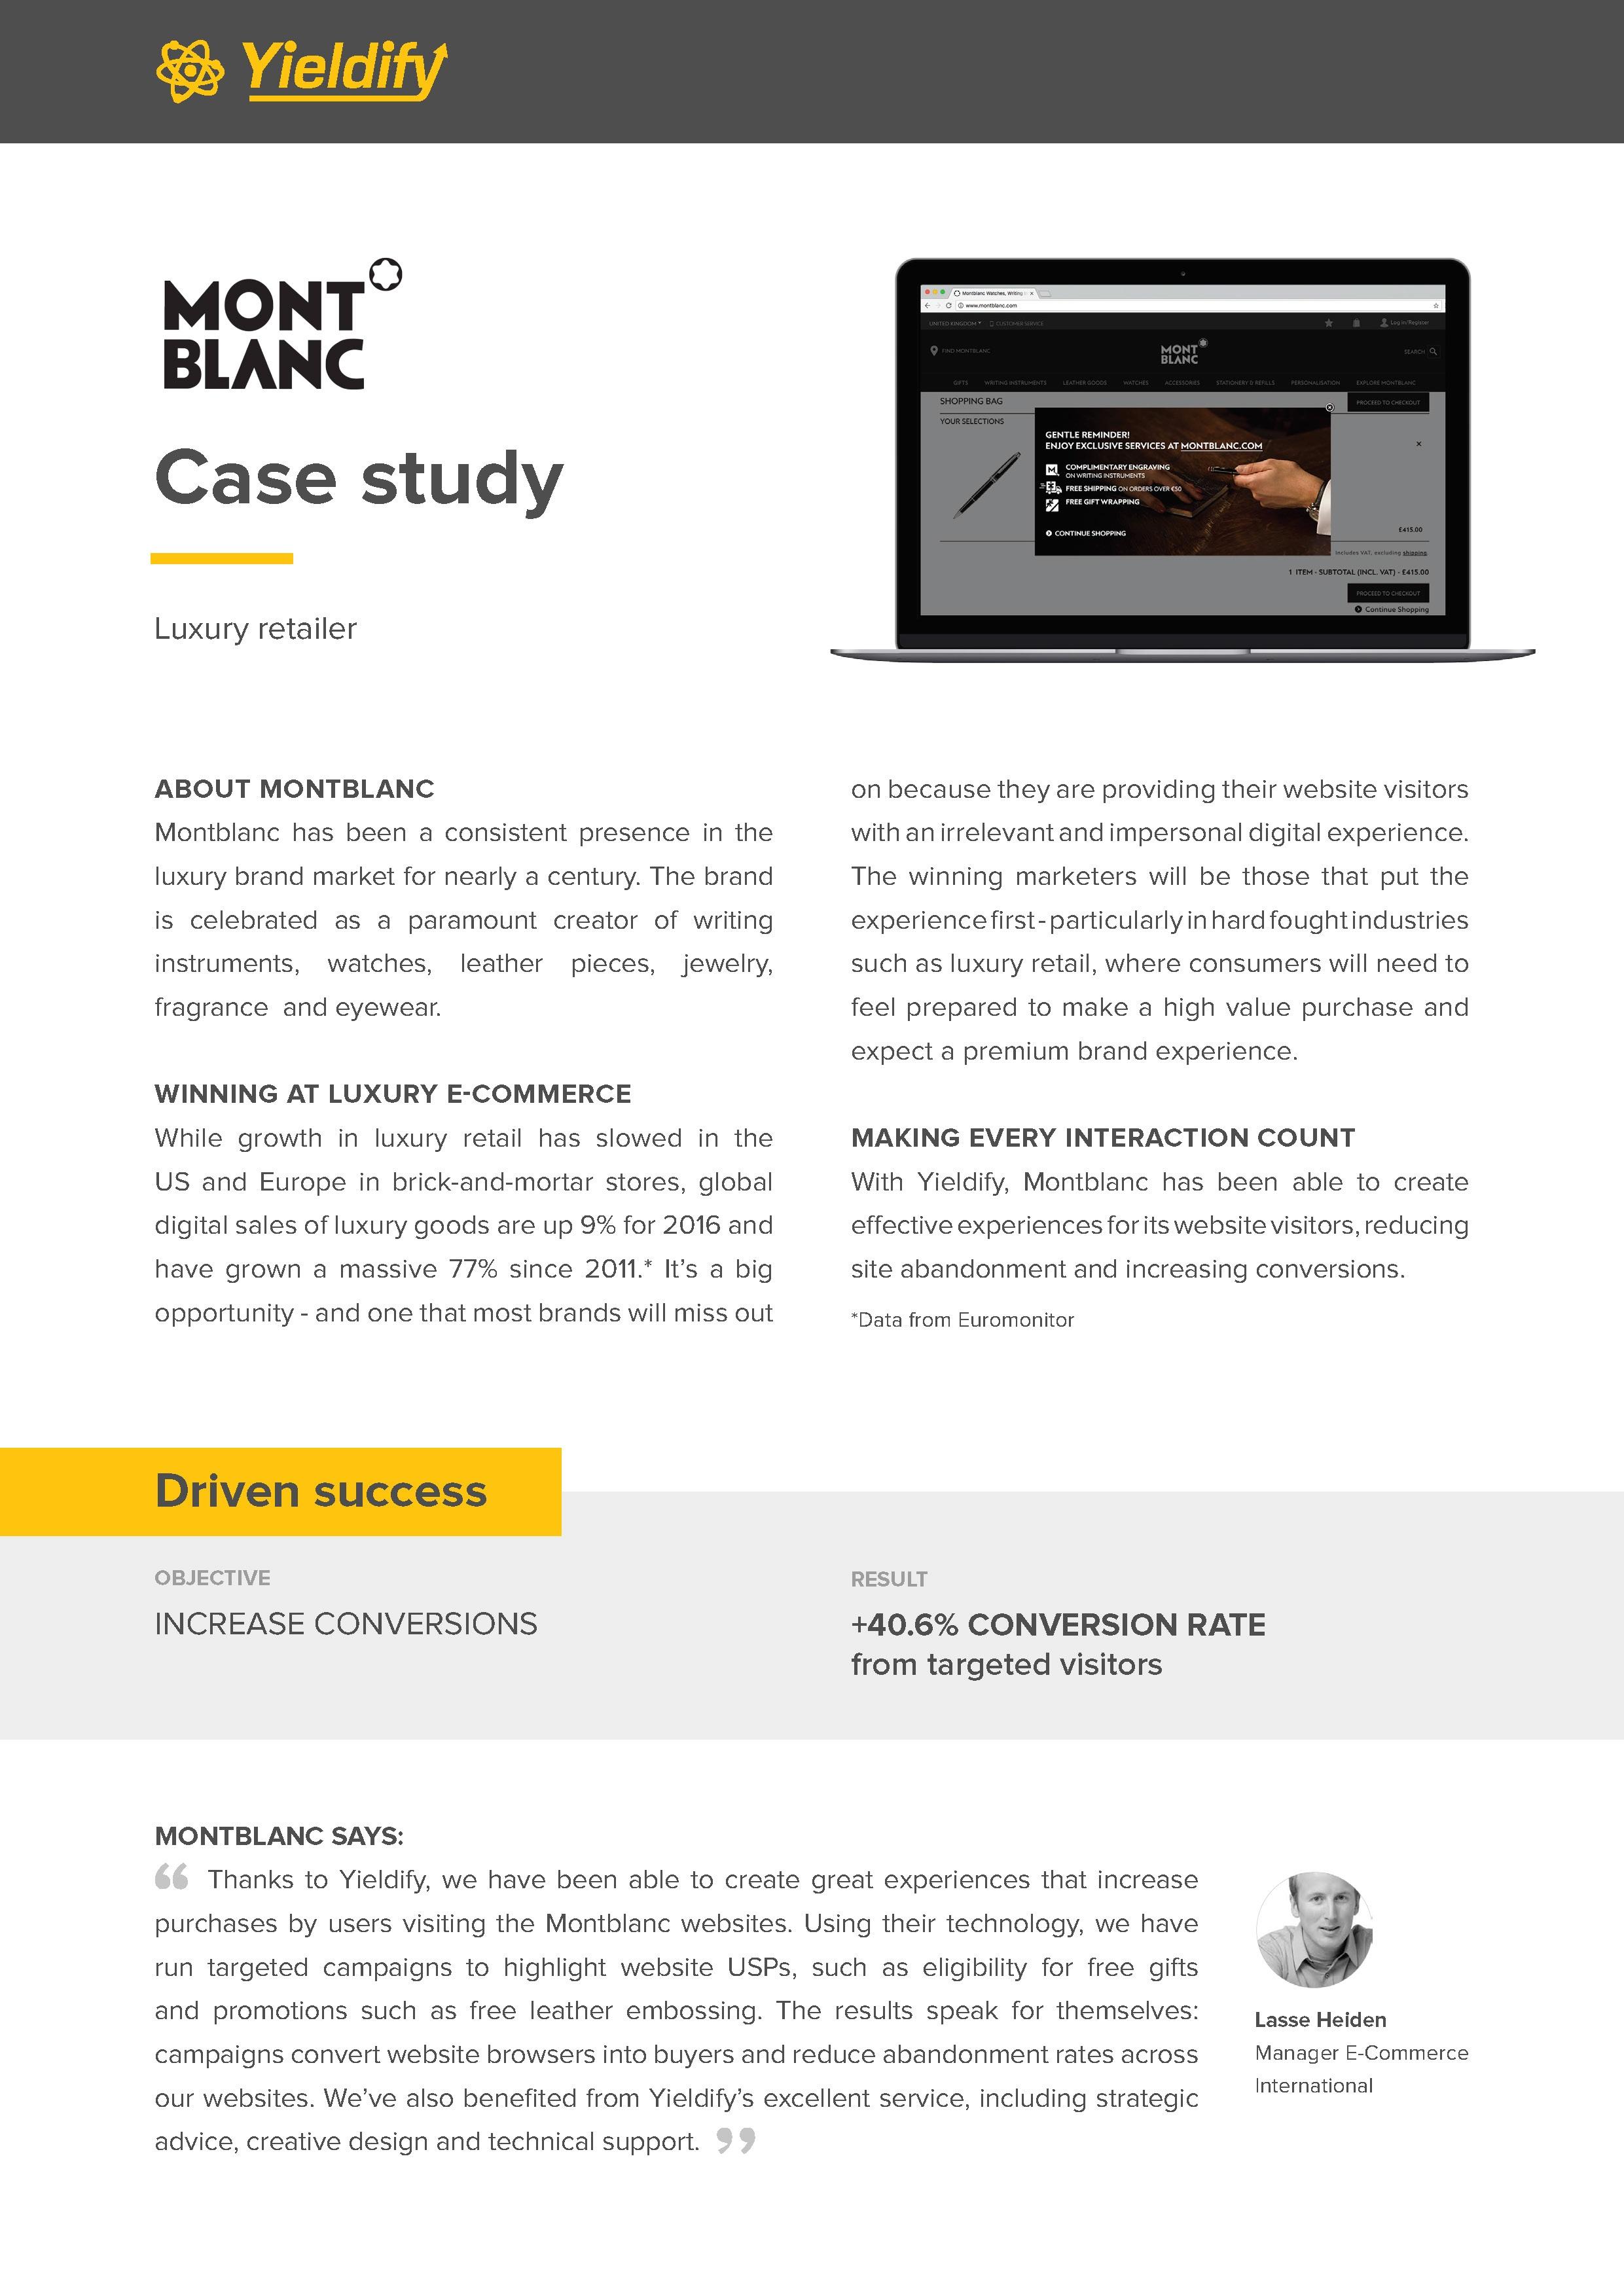 Yieldify case study - Montblanc_Page_1.jpg